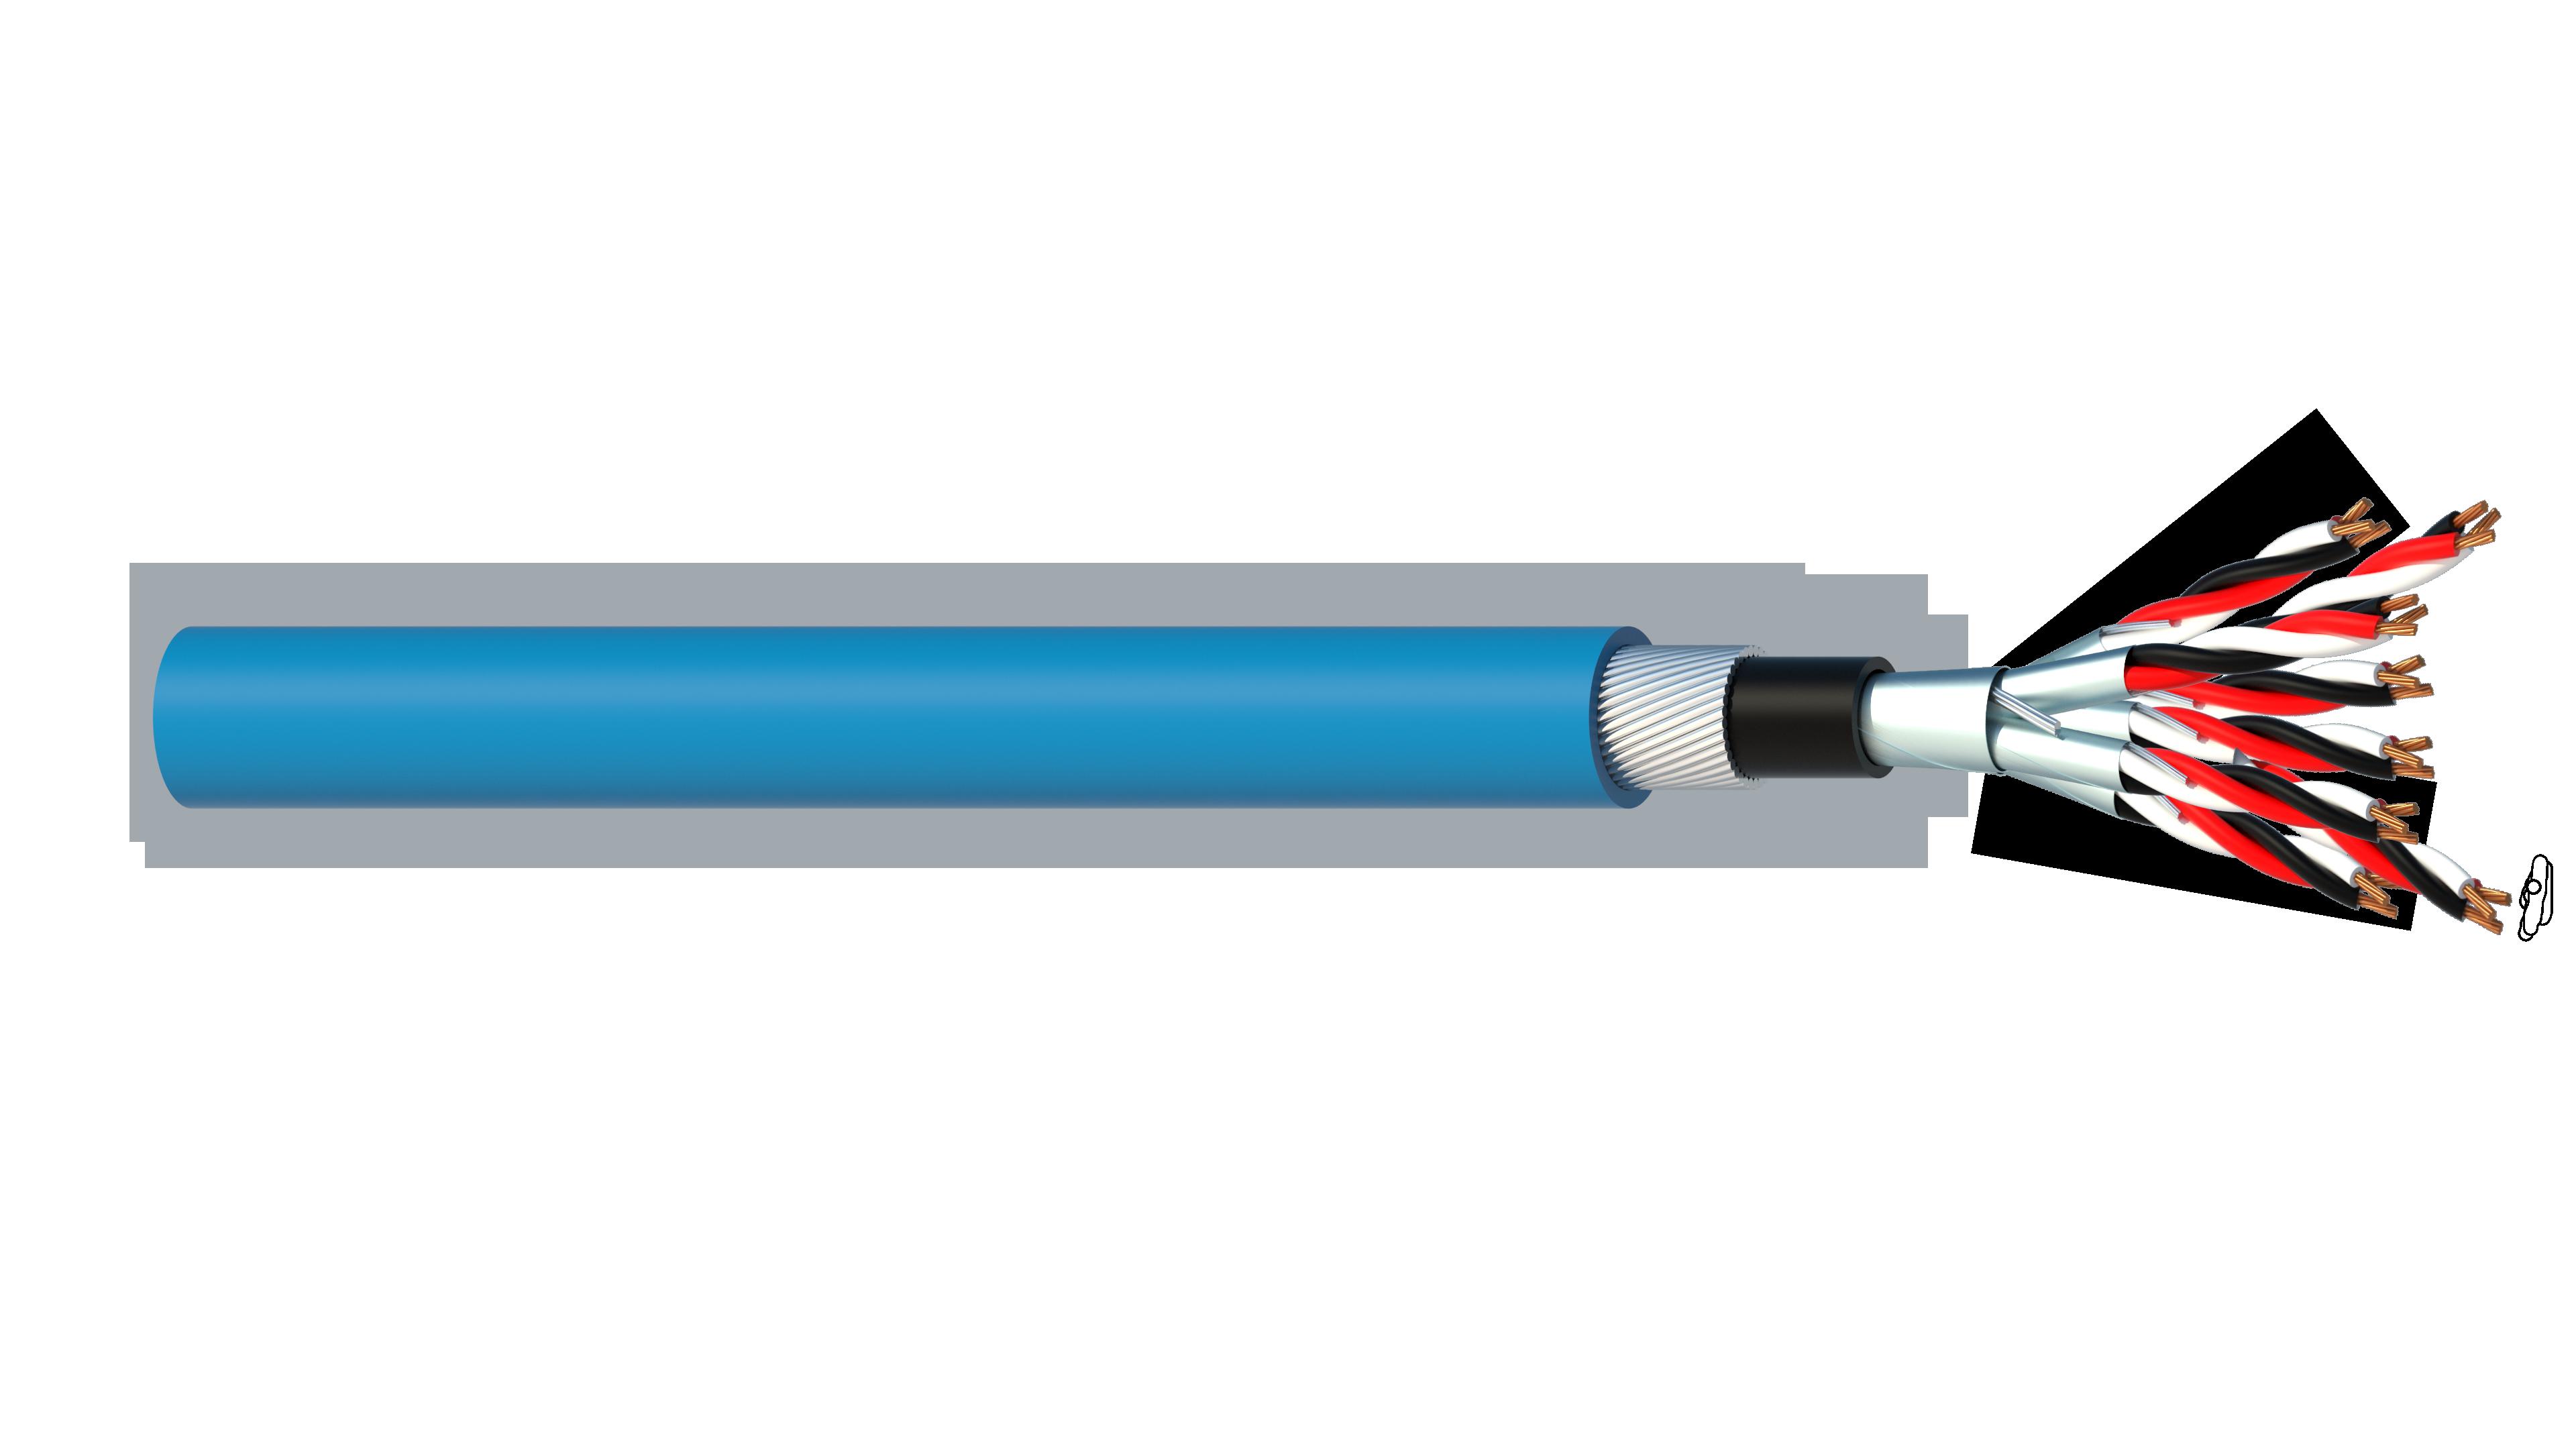 8 Triad 0.5mm2 Cu/PVC/ISOS/PVC/SWA/PVC Maser Instrumentation Cable - Blue Sheath